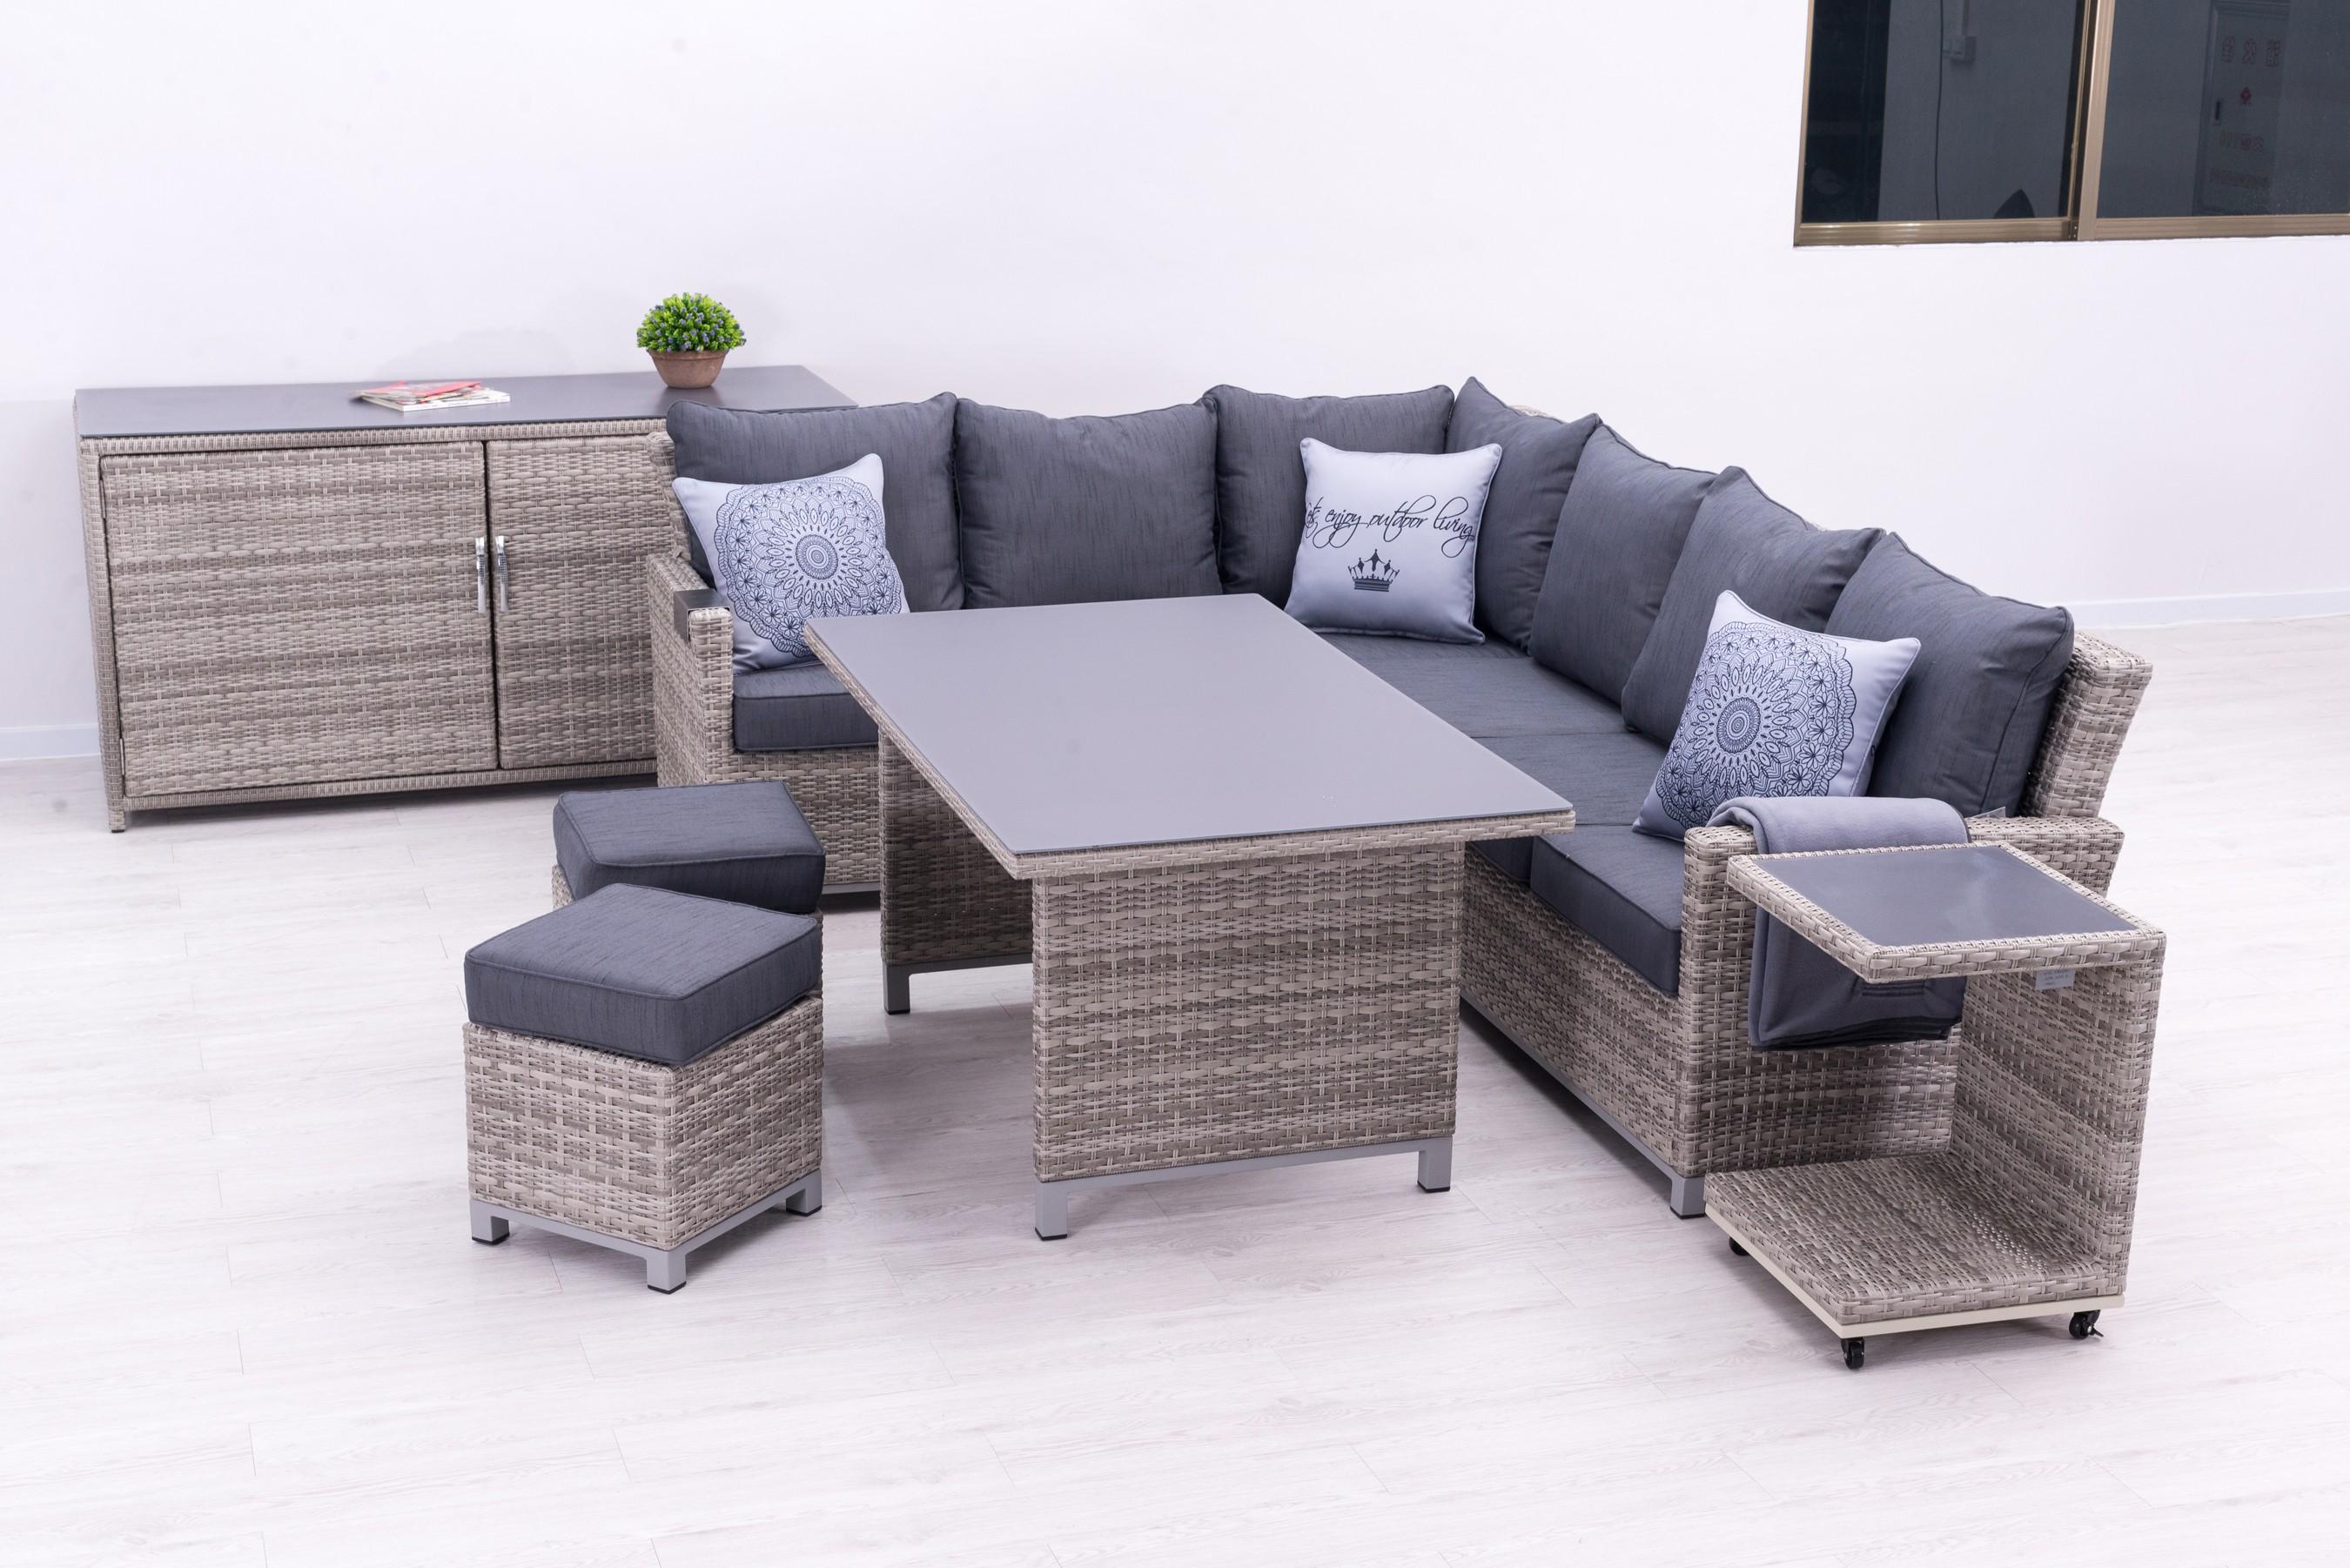 Sungörl Lounge Set / Havanna DeLuxe Set Polyrattan mixed-grey 9-teilig Bild 2